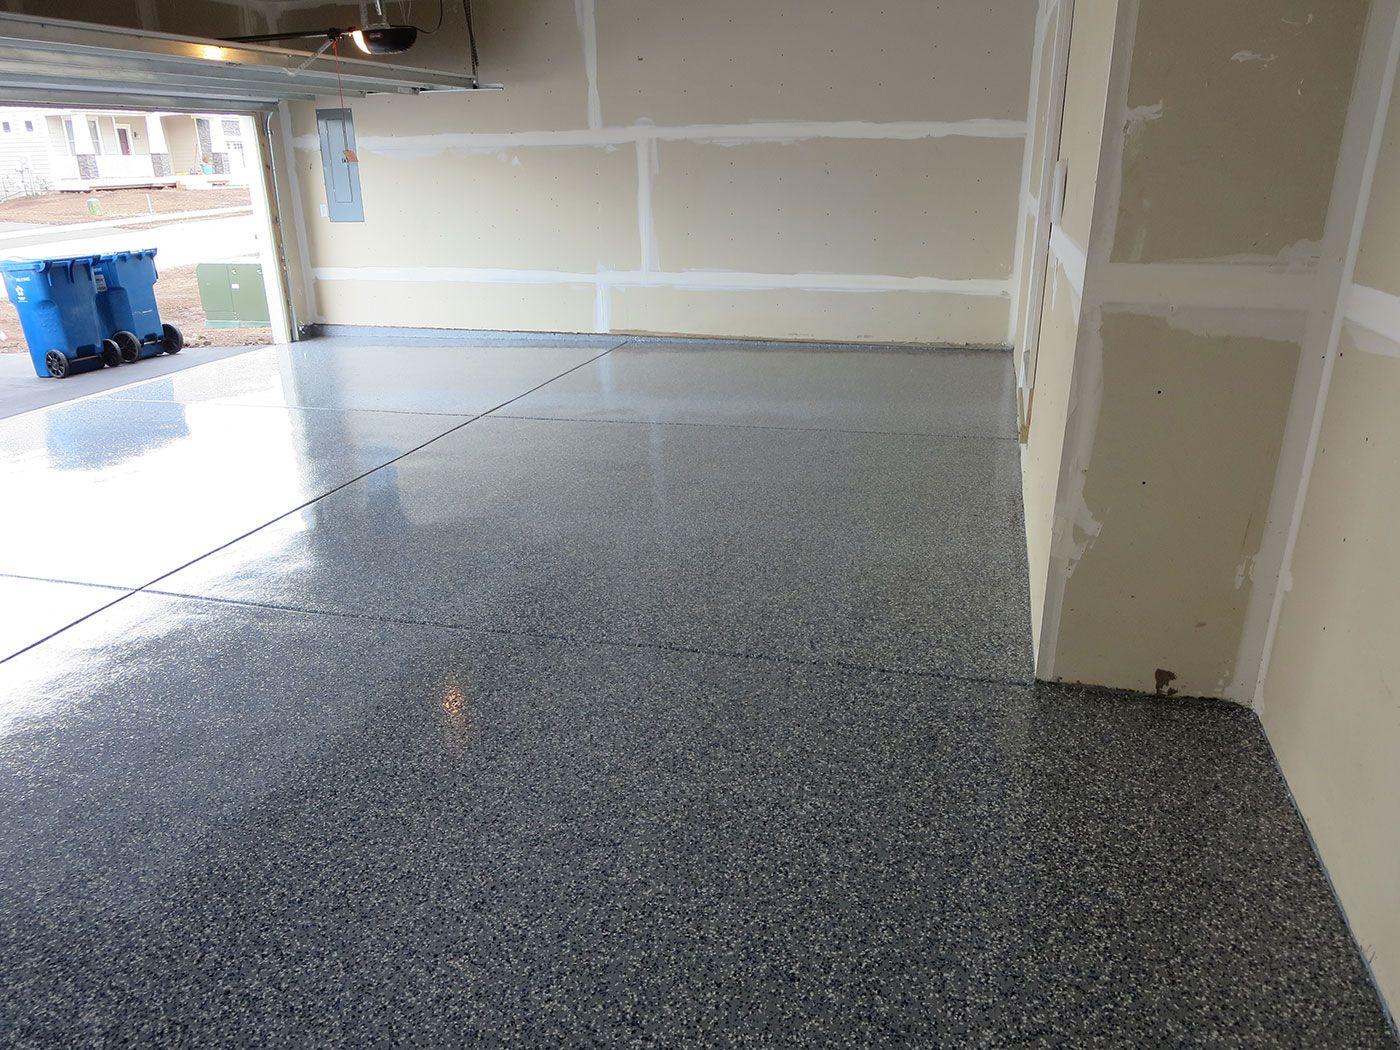 Gallery Residential 1 Epoxy Floor Garage Floor Epoxy Epoxy Floor Coating